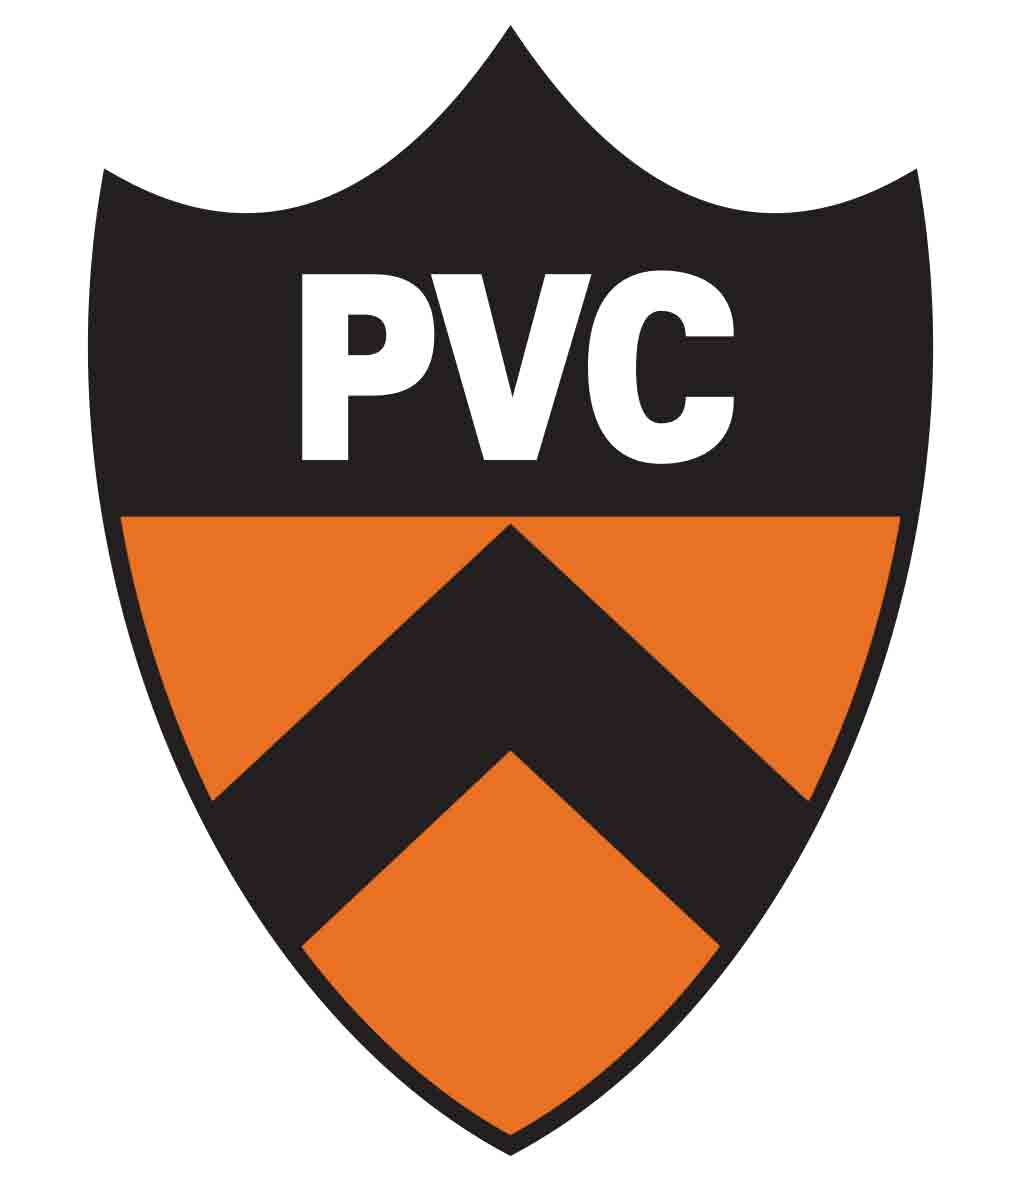 PVC shield 158C